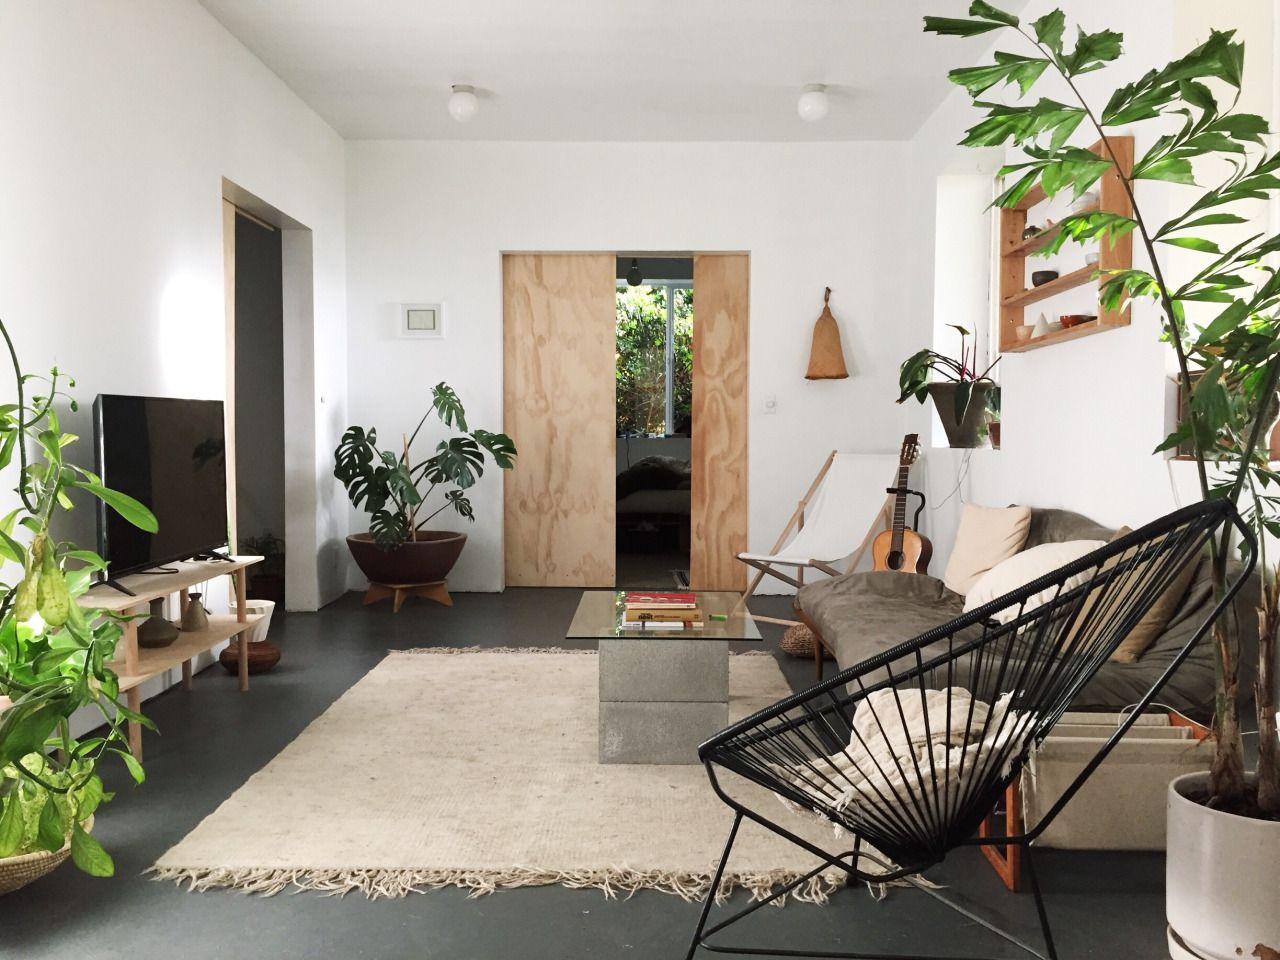 ernests   Home design decor, Interior design living room, Interior